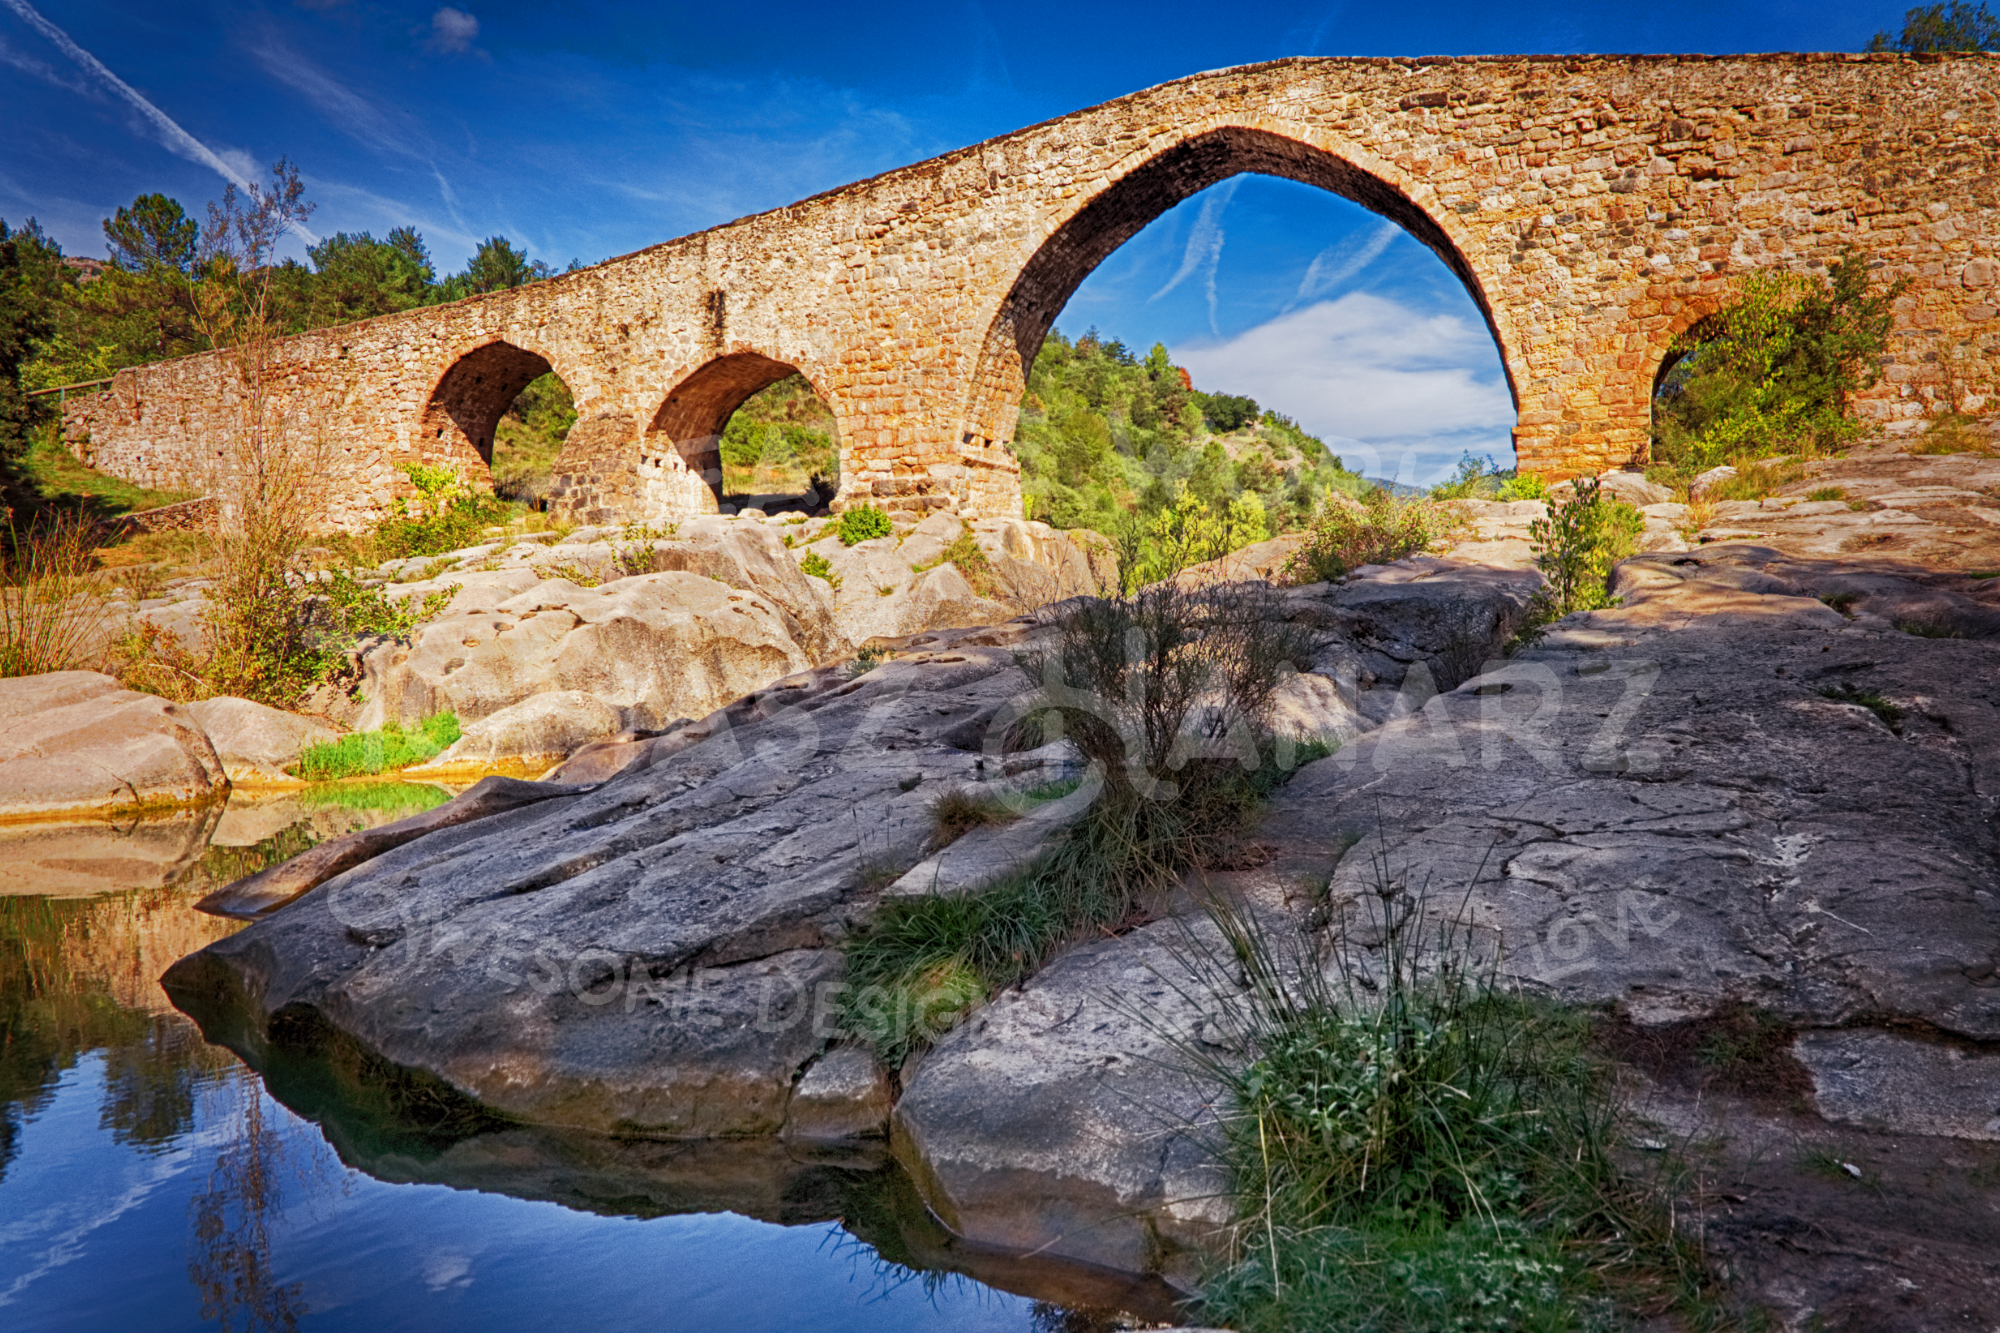 Gothic Stone Bridge Over The River Llobregat Photo Bundle example image 5